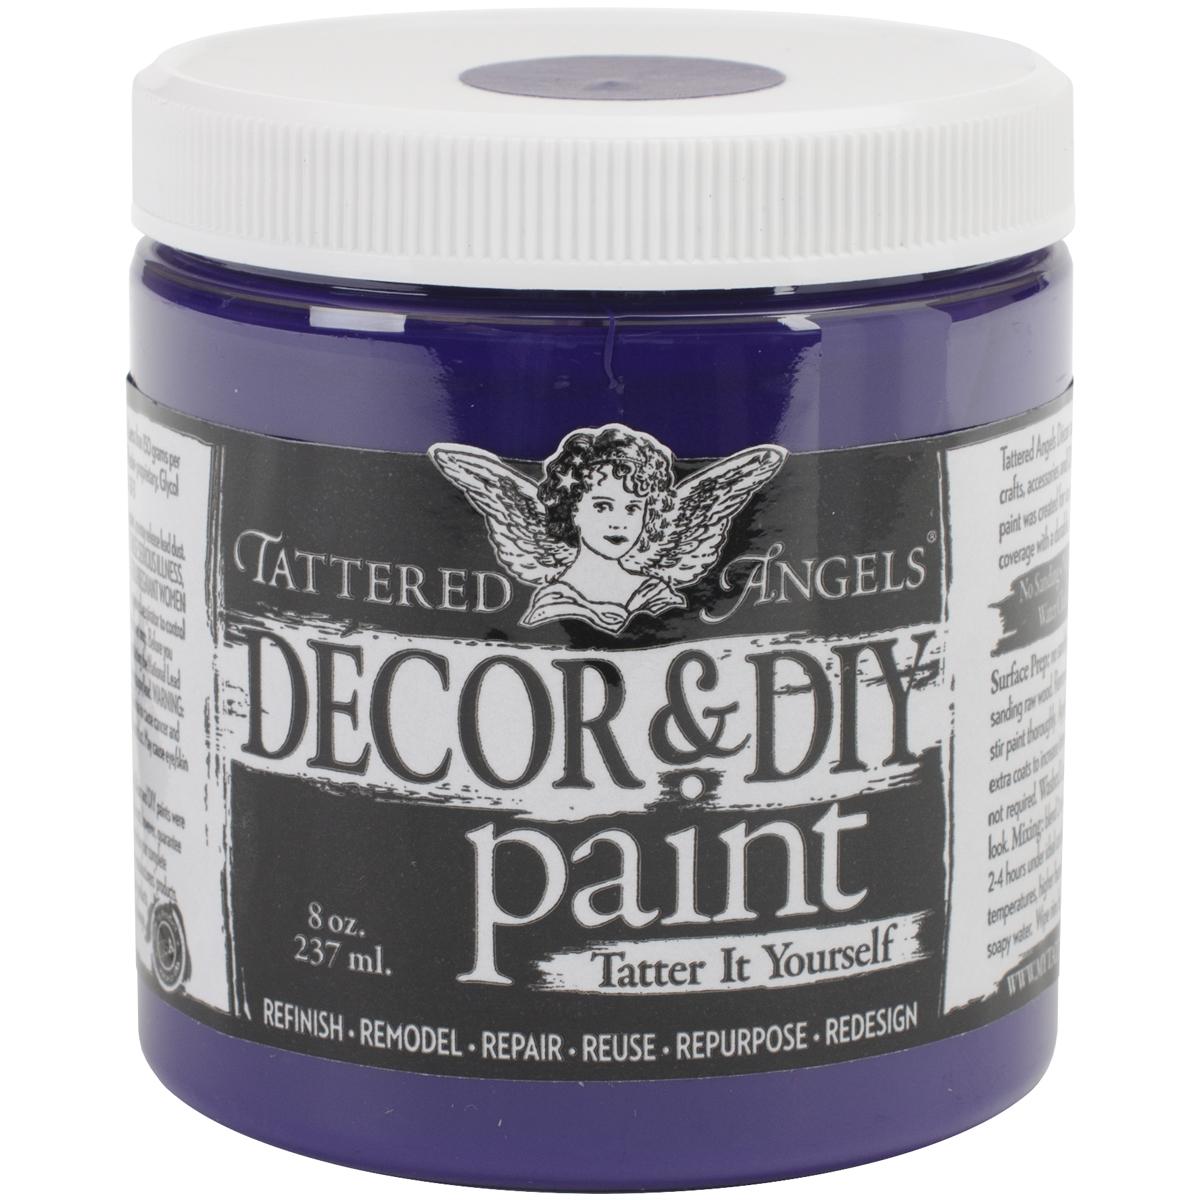 Decor & DIY Paint Cup 8oz-Amethyst